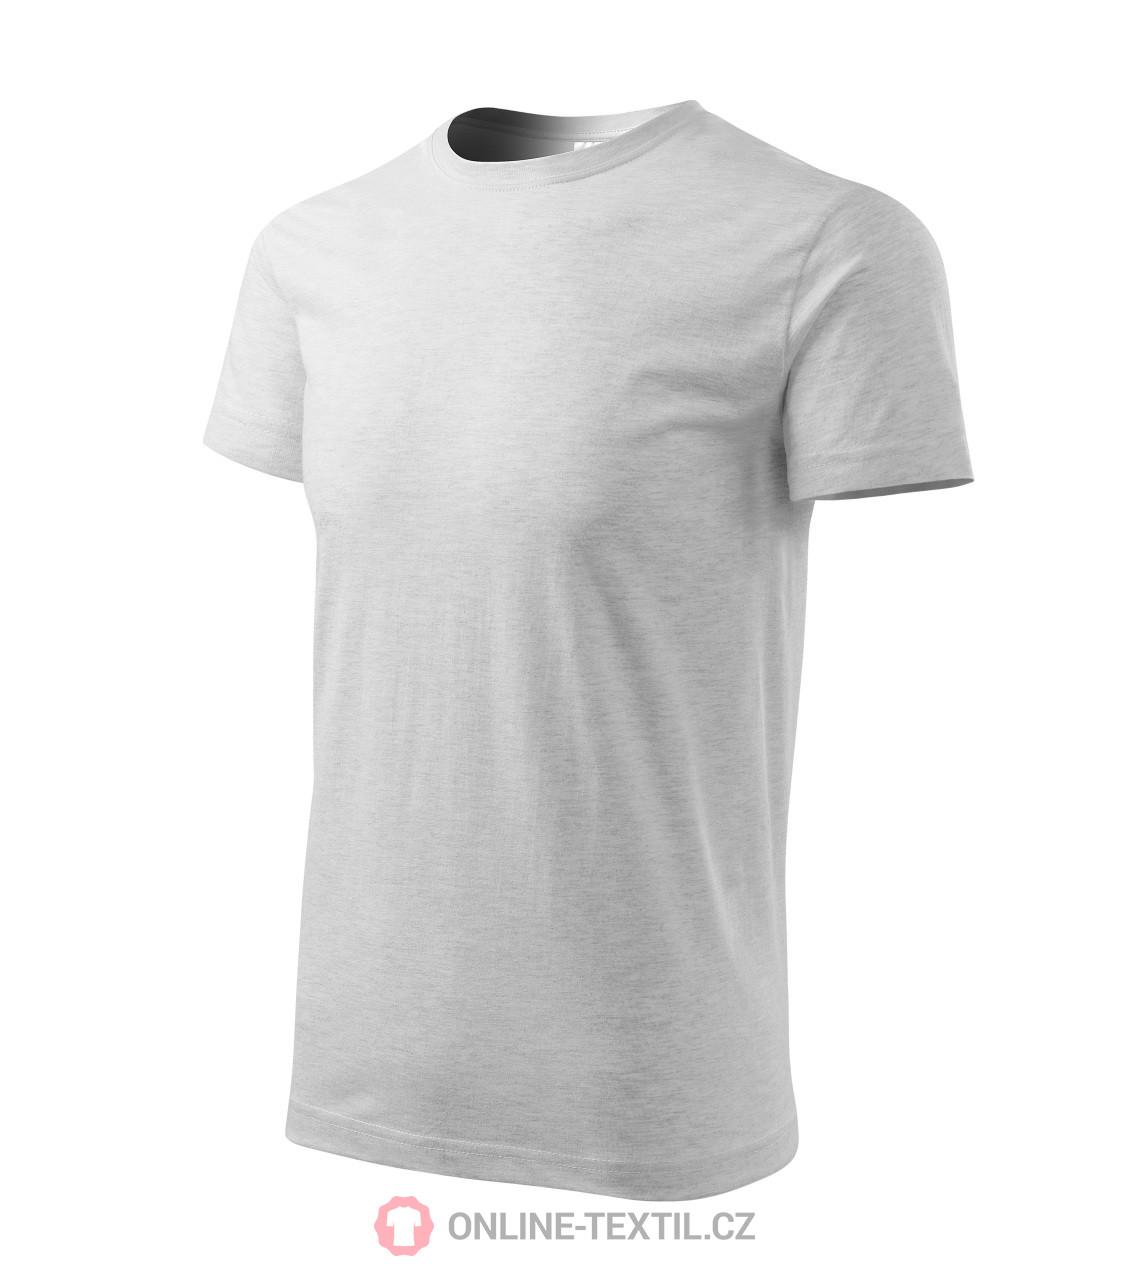 8bb8d5efc ADLER CZECH Heavy New tričko unisex 13A - svetlosivý melír z ...